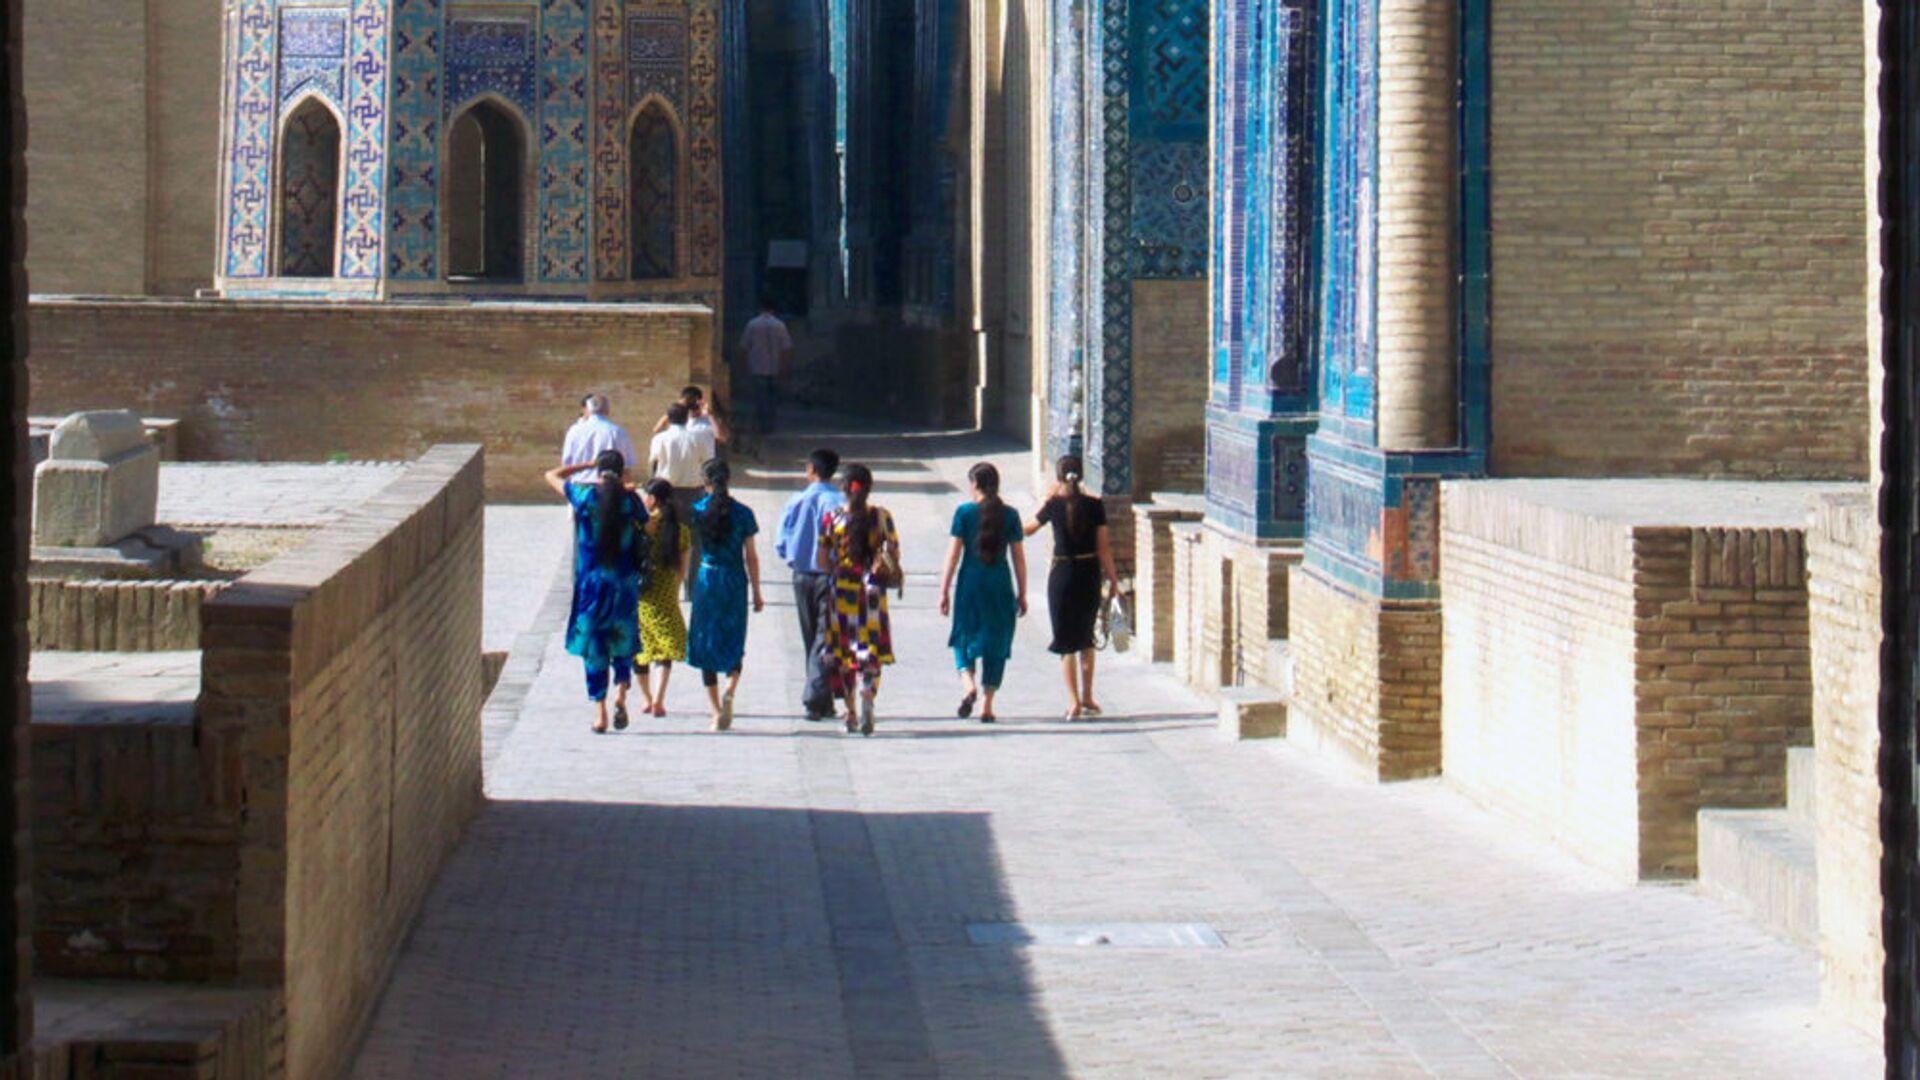 Туристы прогуливаются в Самарканде, Узбекистан - Sputnik Узбекистан, 1920, 30.03.2021